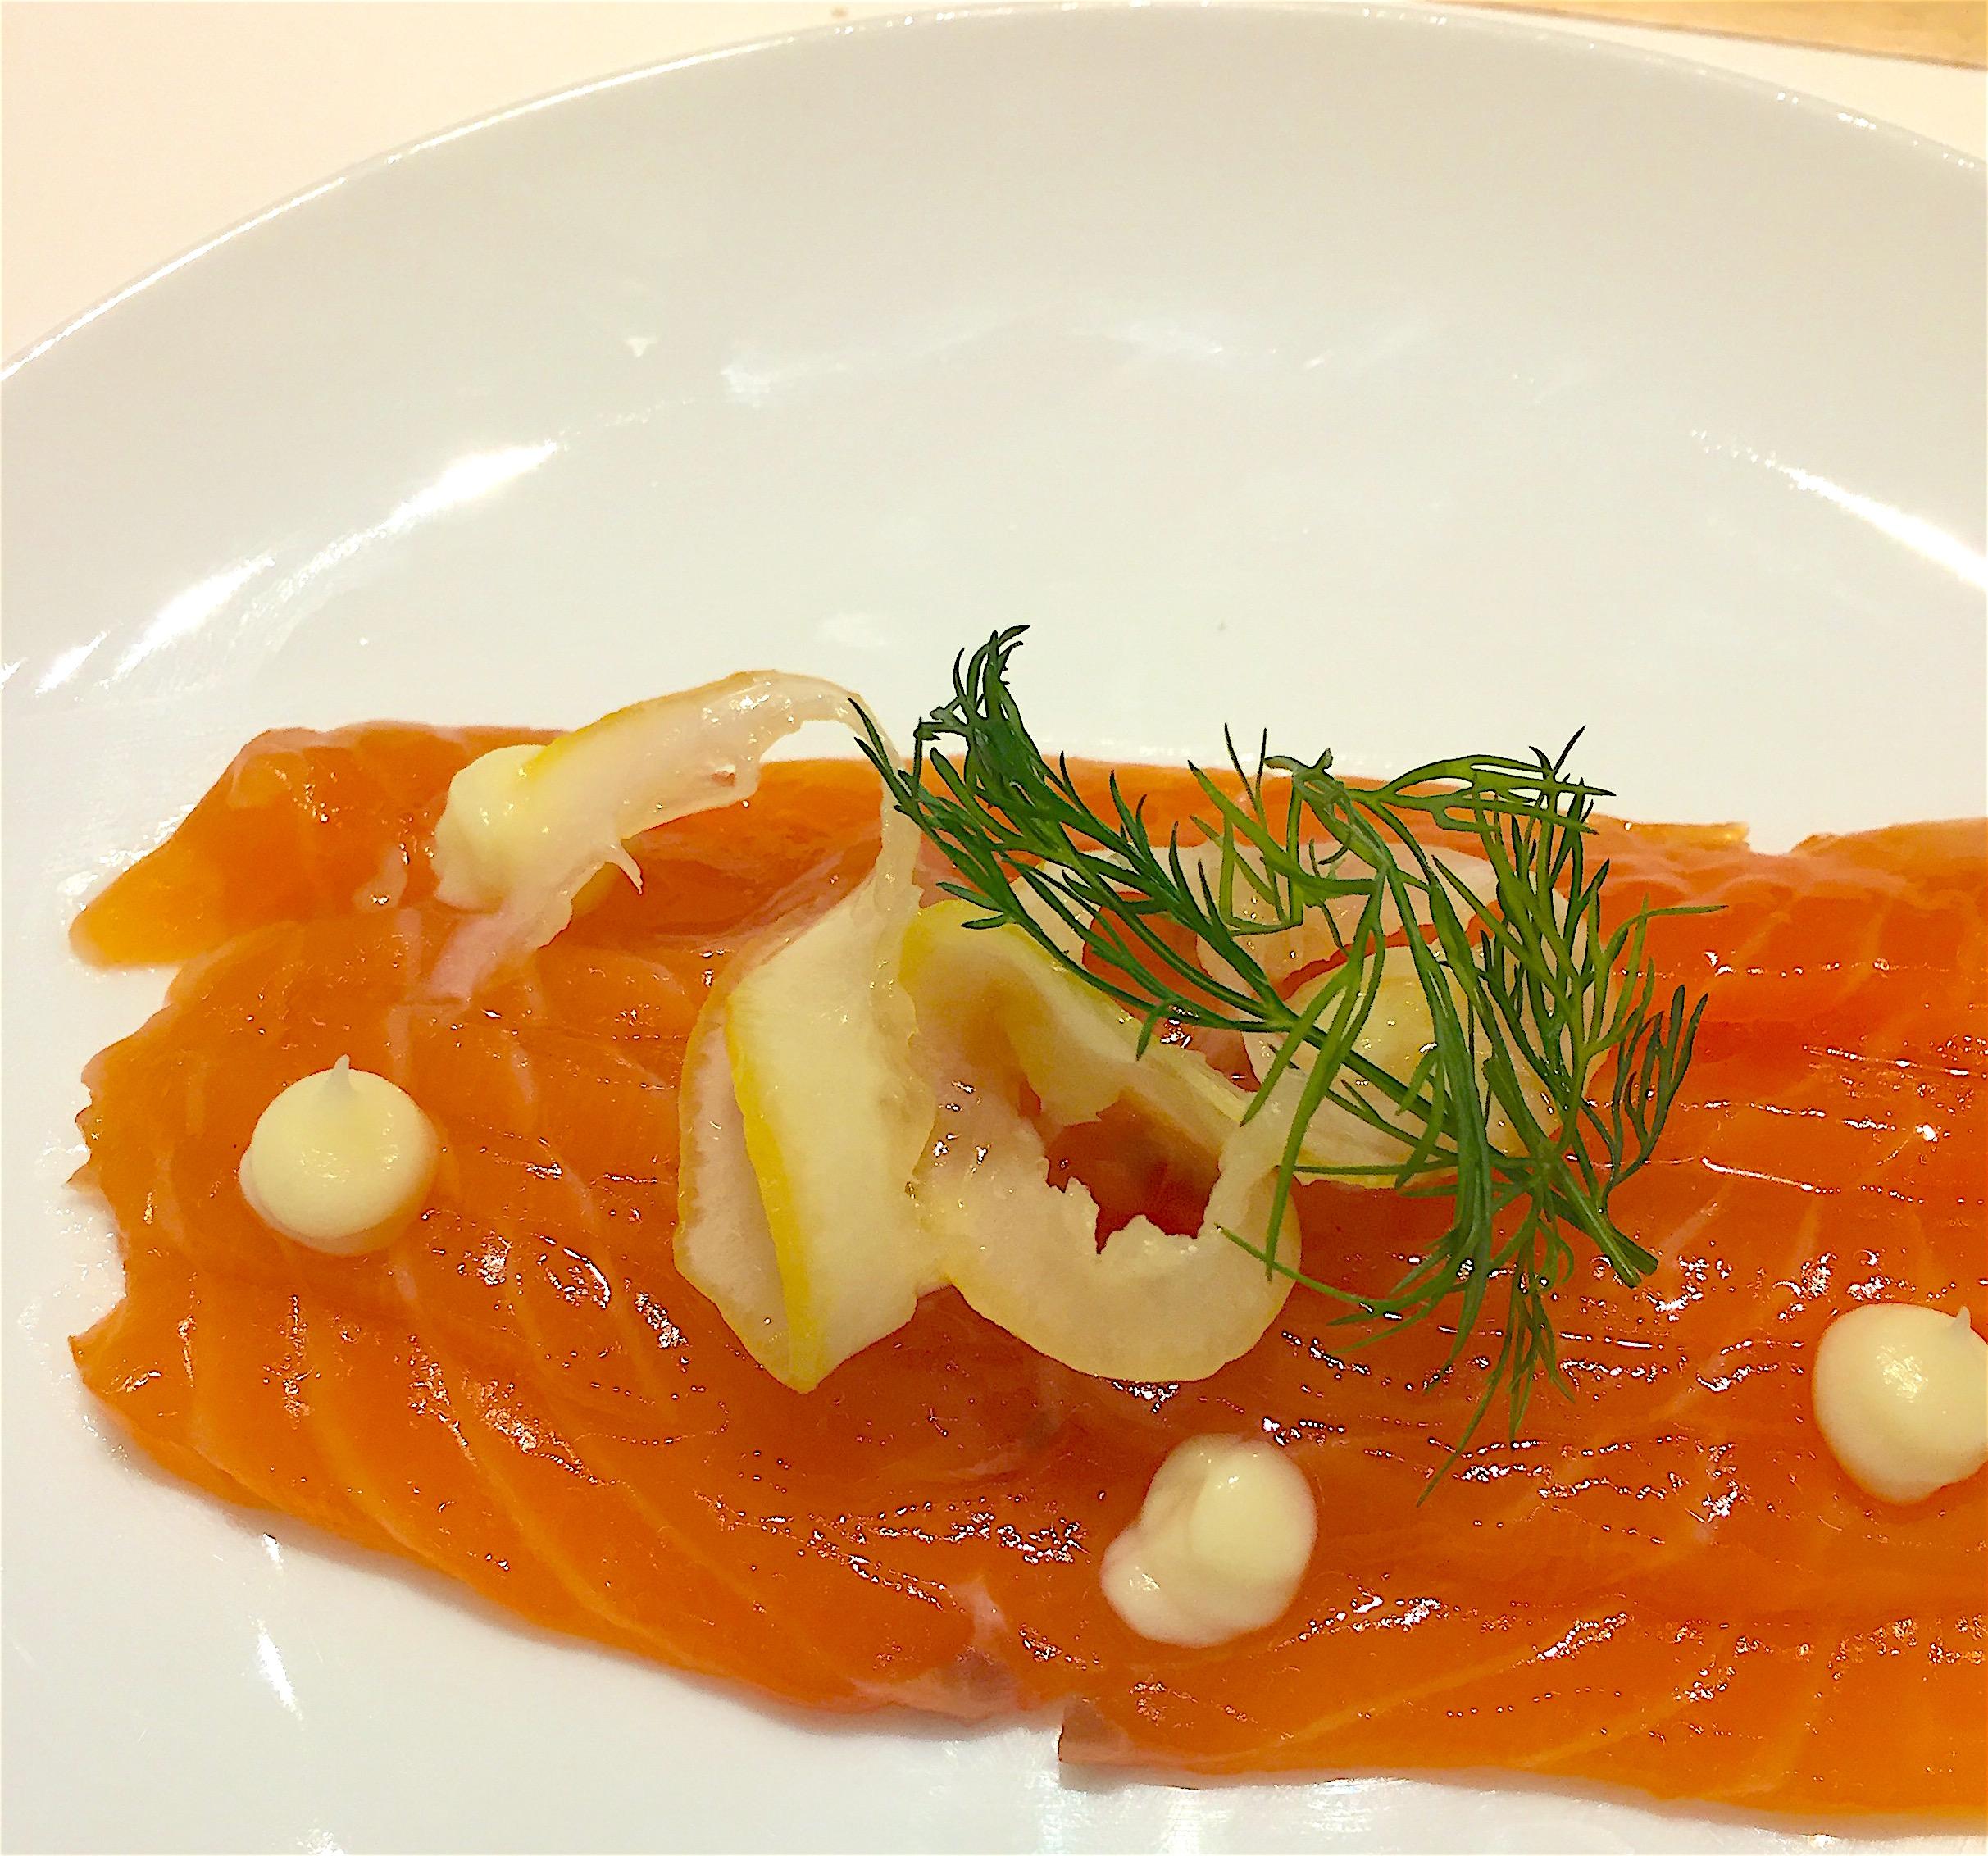 Etoile du Nord - Marinated salmon @ Alexander Lobrano